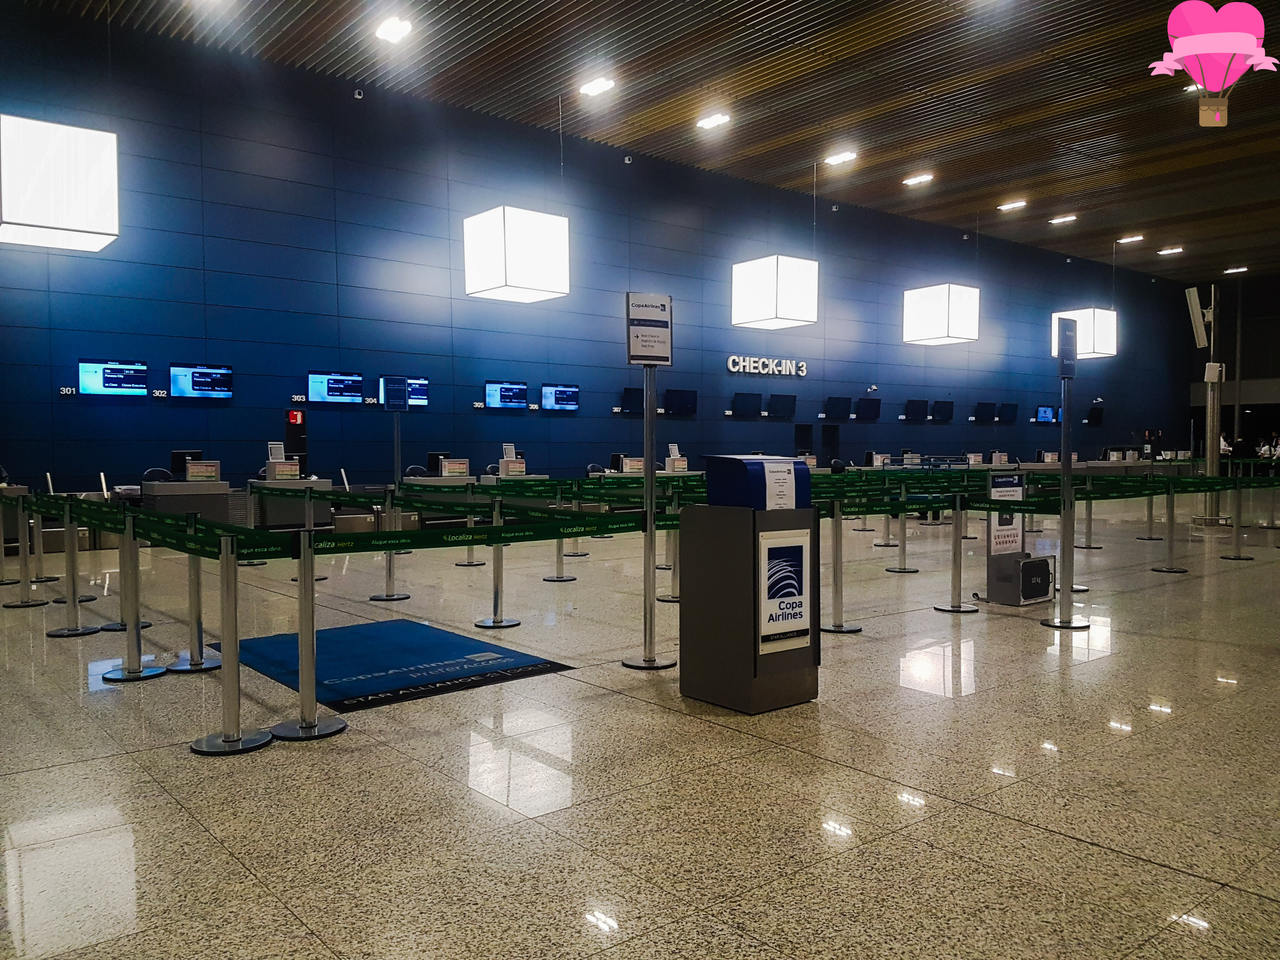 aeroporto-confins-bh-coronavirus